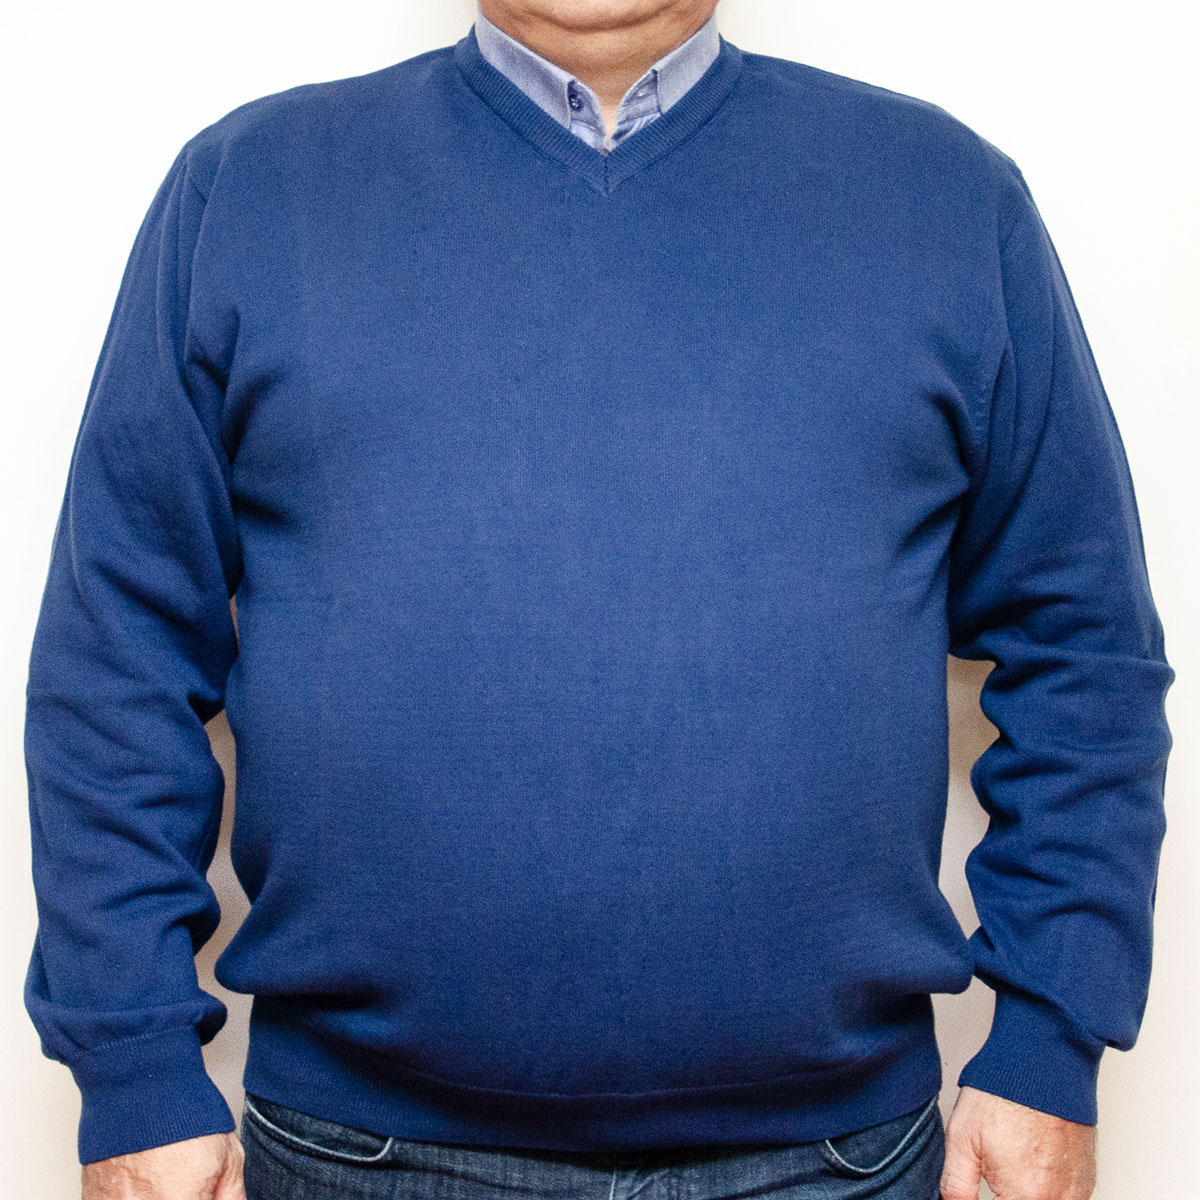 Pulover albastru cu anchior , Marime 3XL - egato.ro